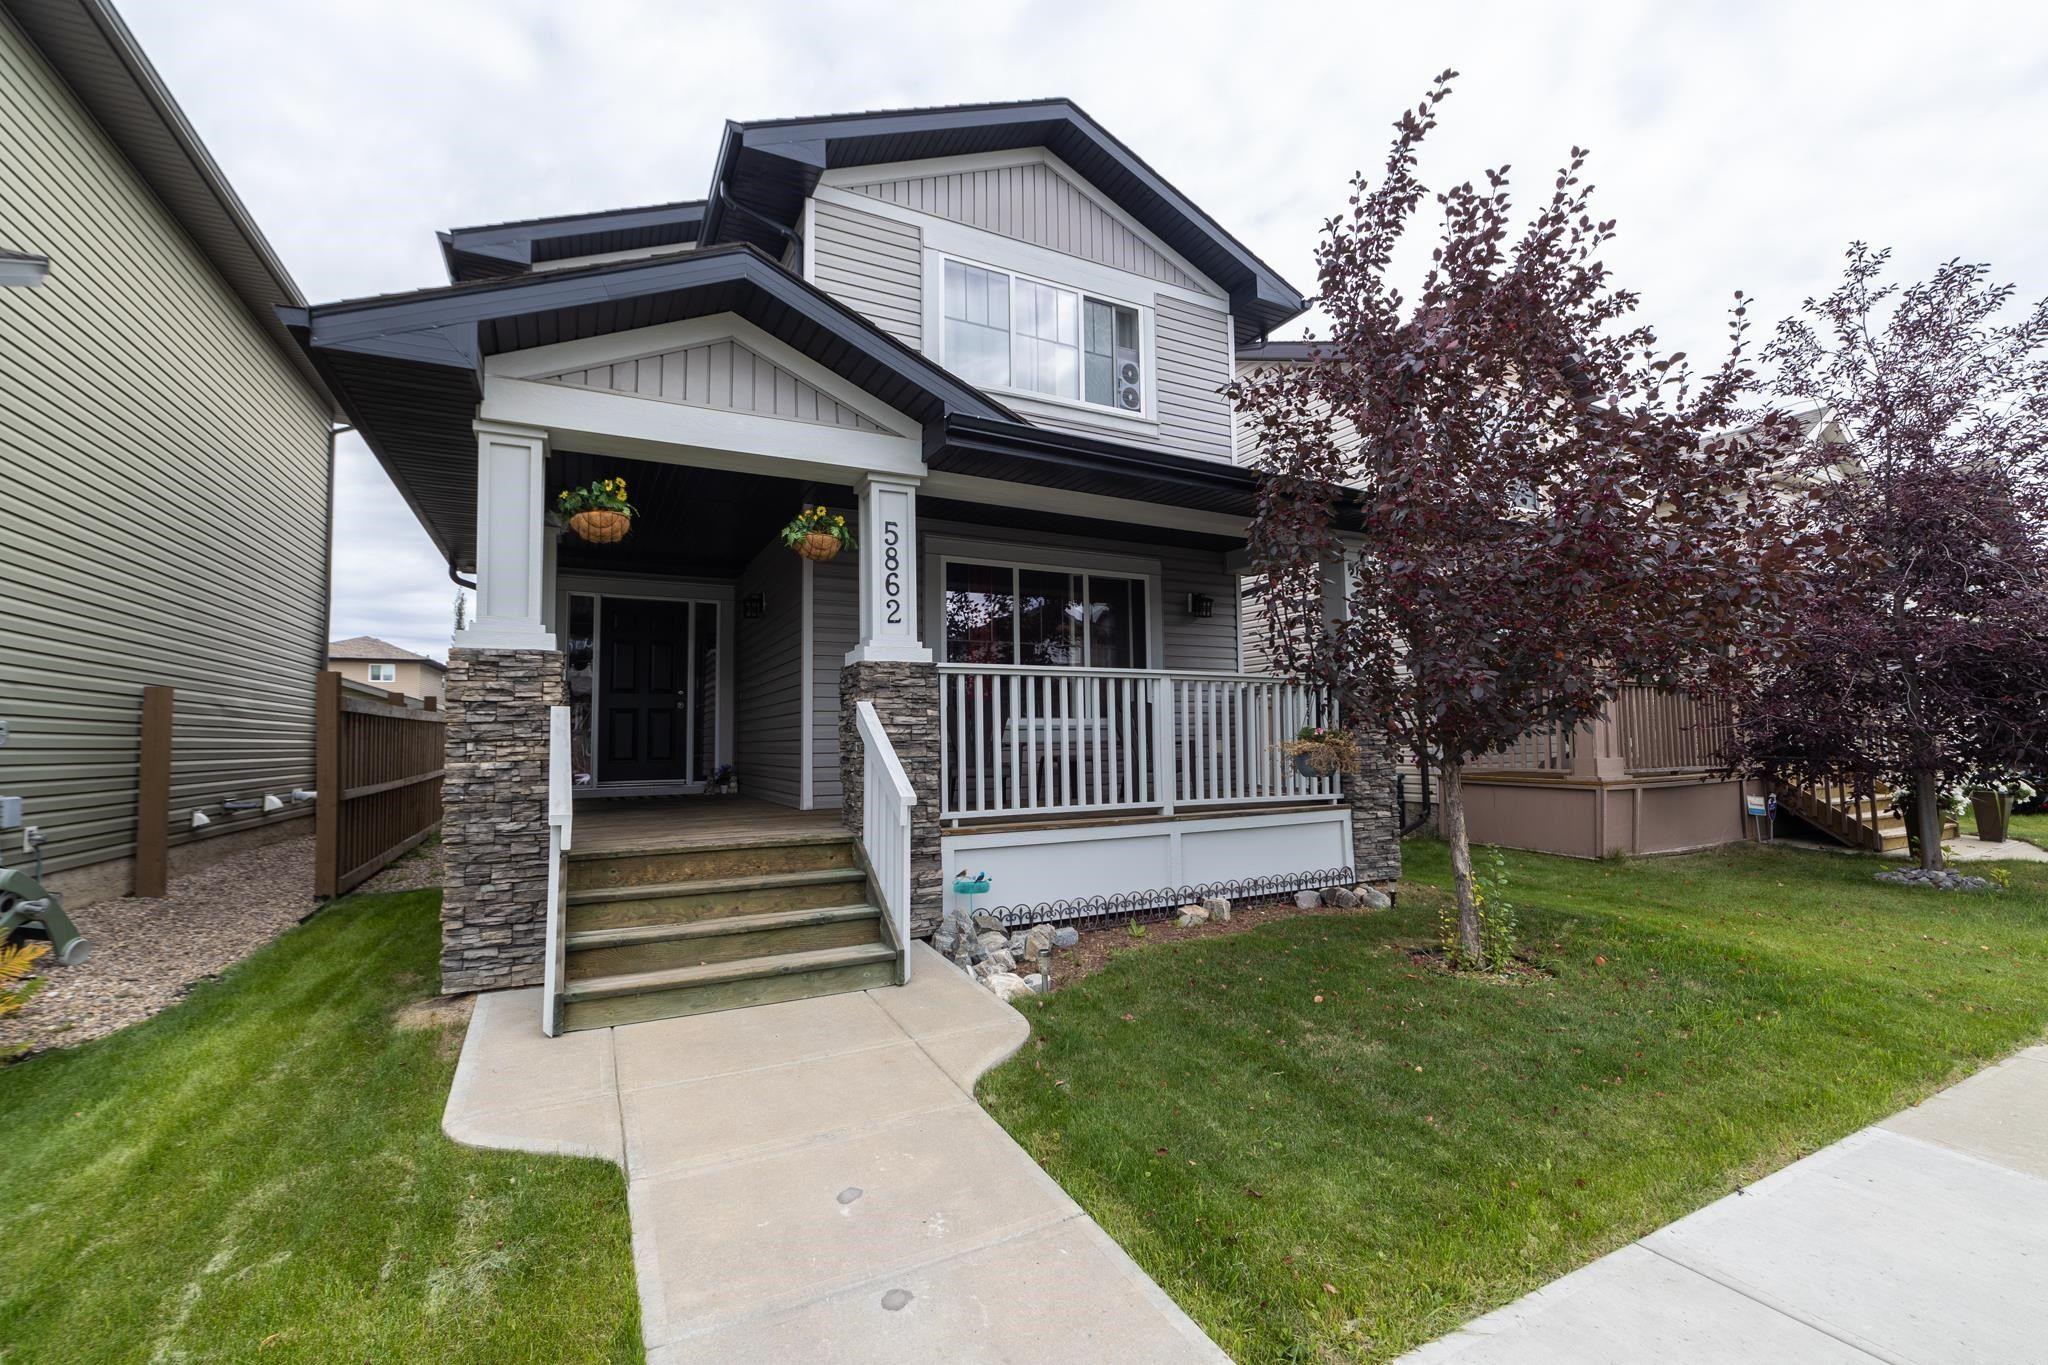 Main Photo: 5862 168A Avenue in Edmonton: Zone 03 House for sale : MLS®# E4262804